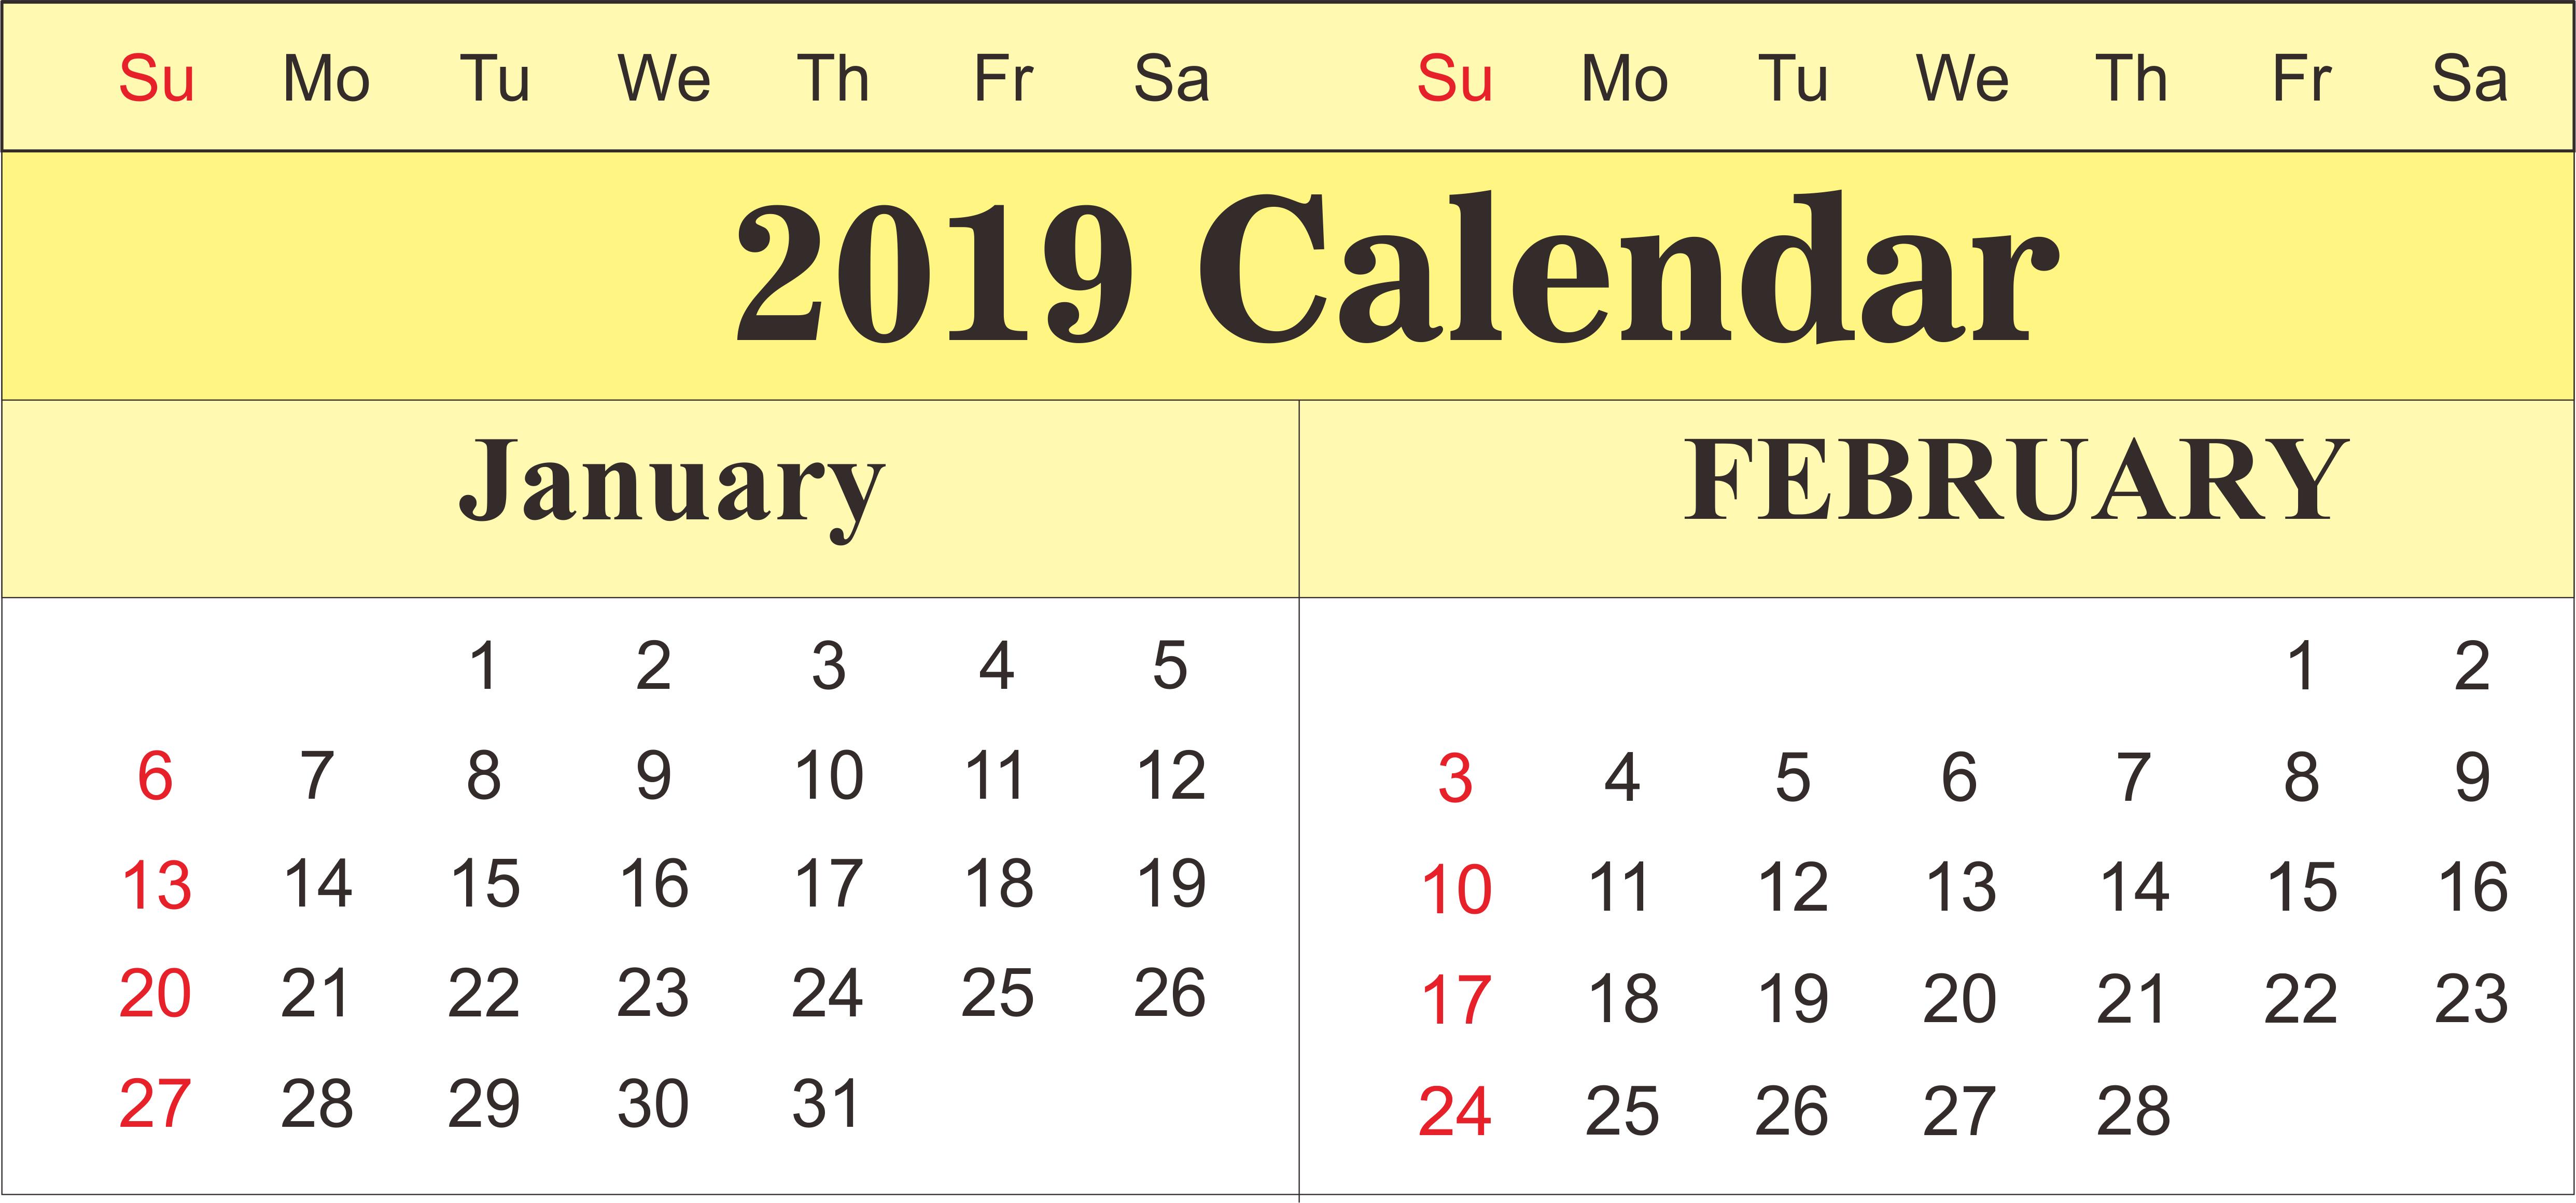 February 7 2019 Calendar Printable January and February 2019 Calendar   250+ February 2019